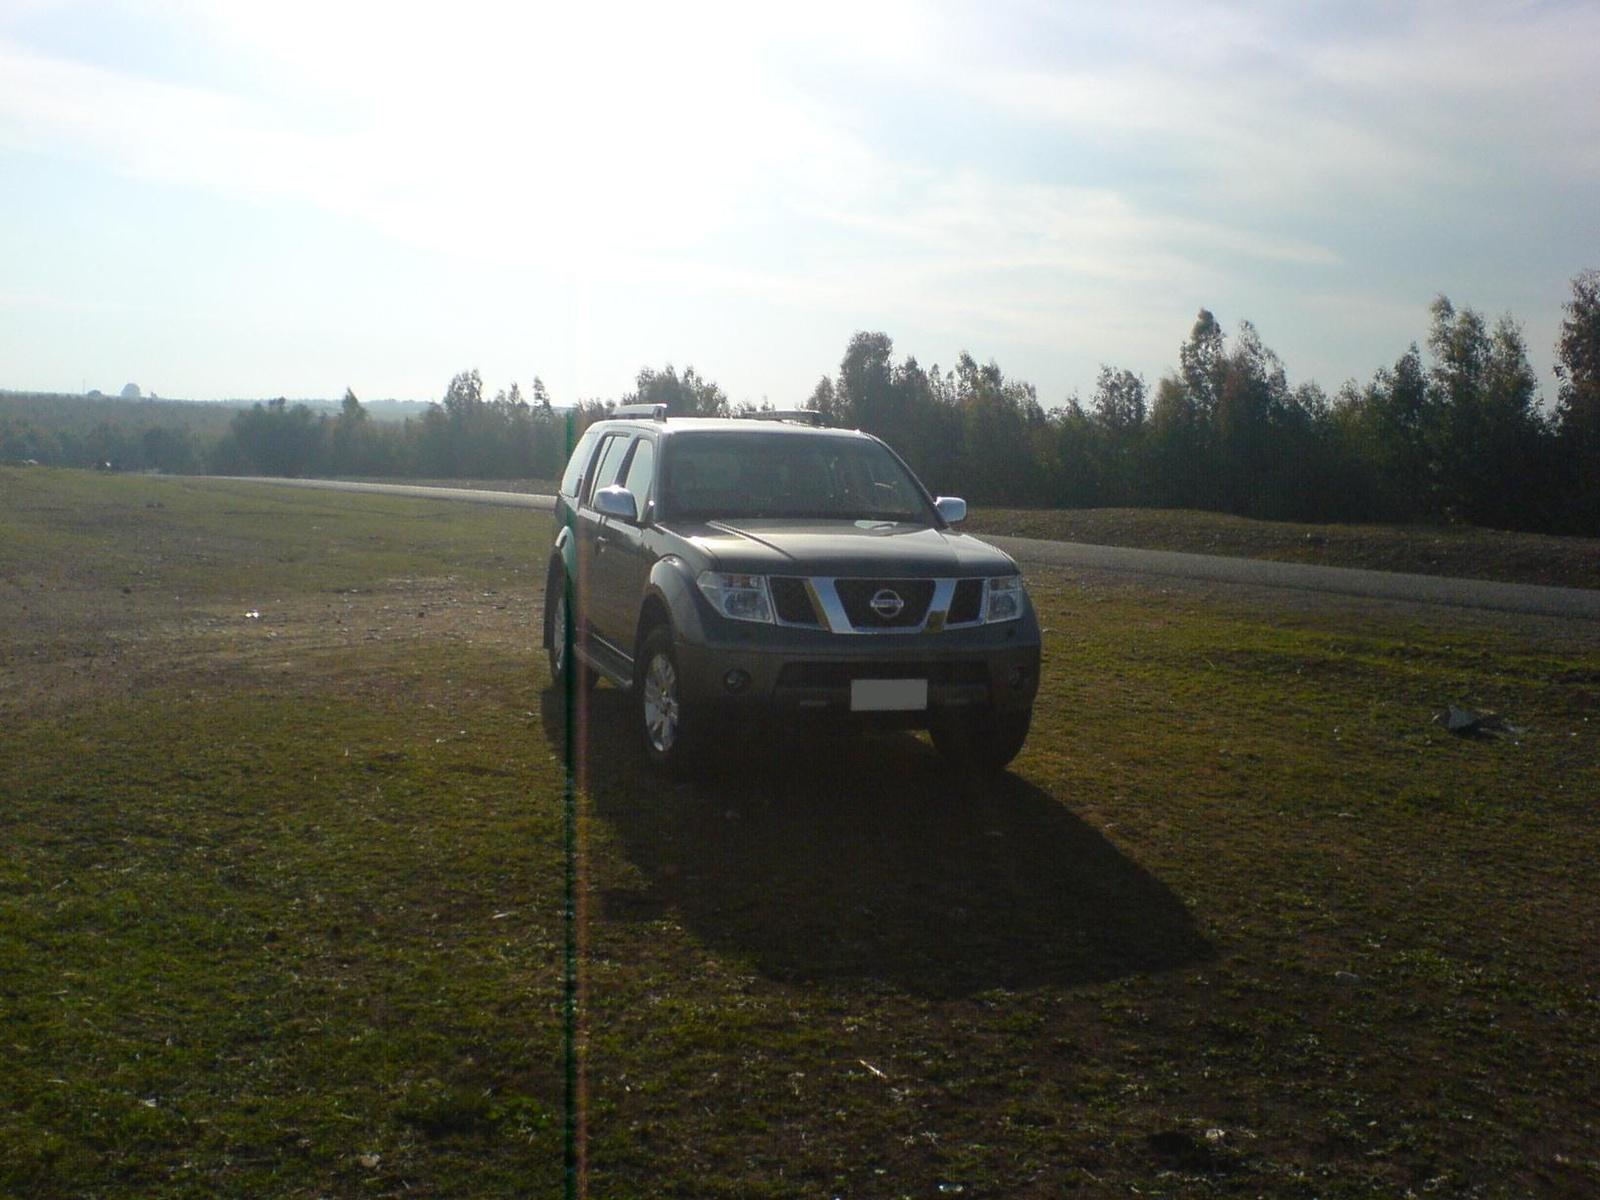 2008 Nissan Pathfinder LE - 2008 Nissan Pathfinder LE 4X4 ...